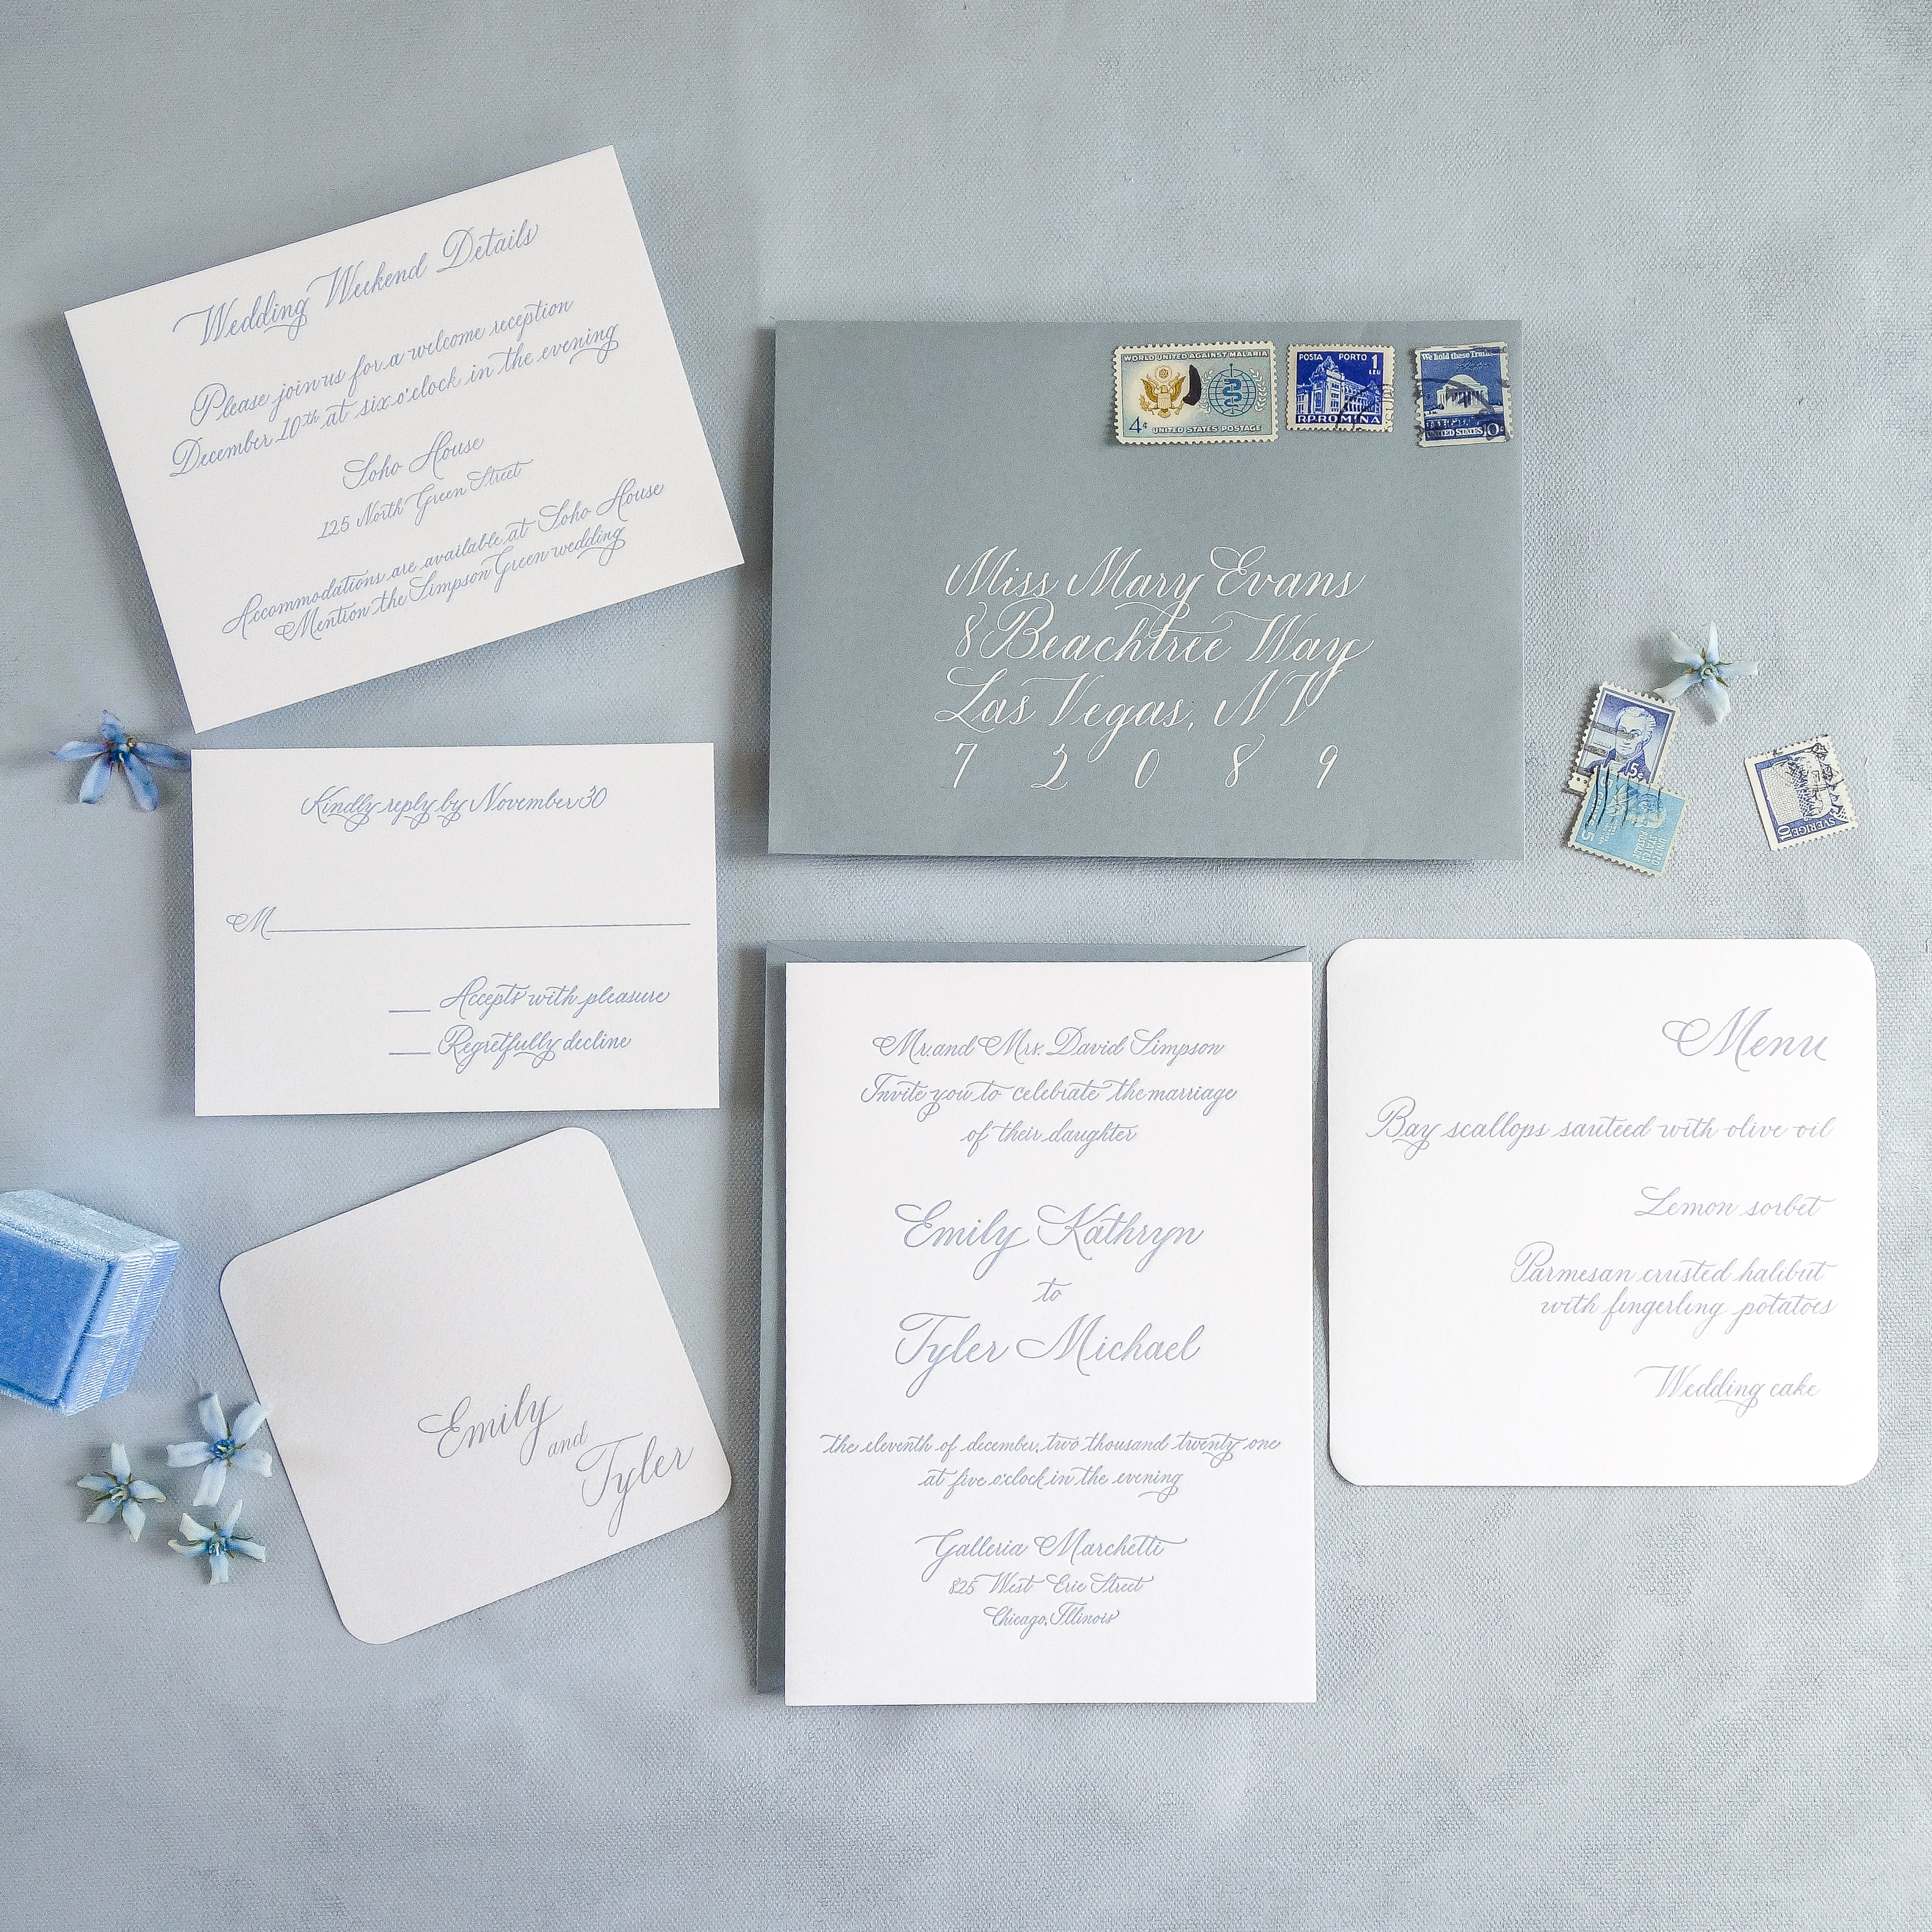 Chicago Calligrapher Chicago Wedding Invitations (14)